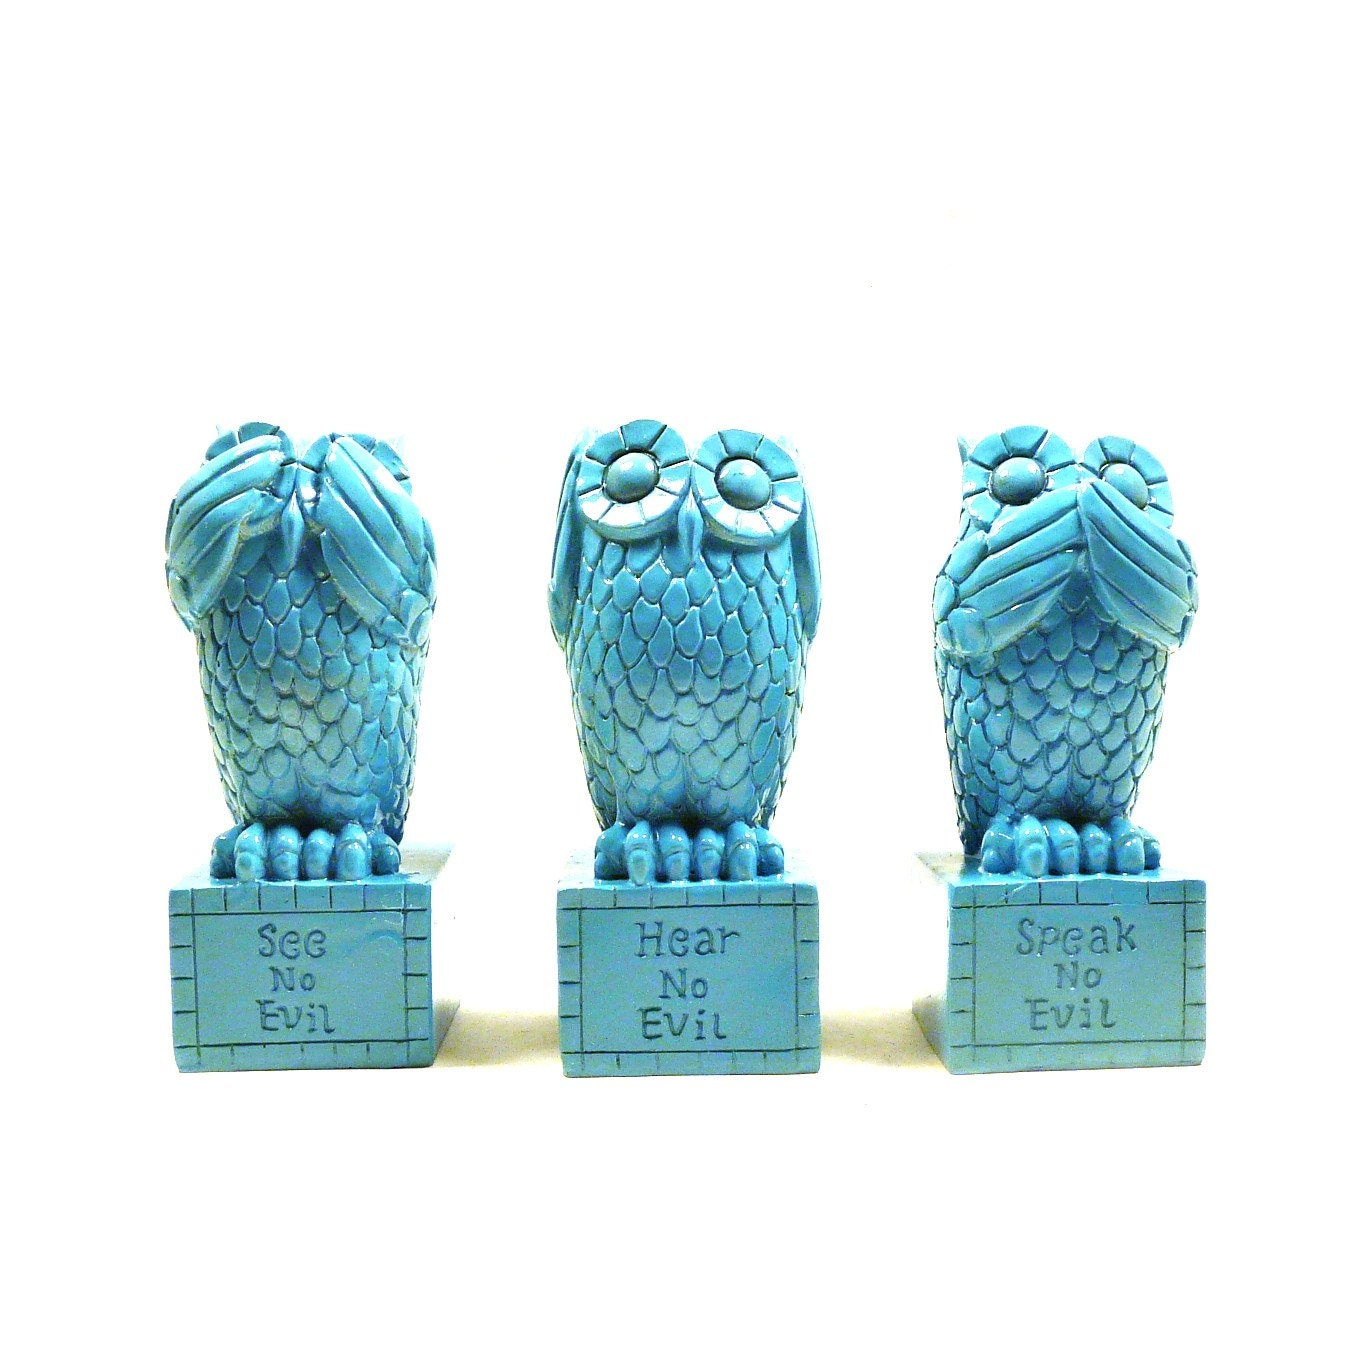 Hear No Evil Owls Speak No Evil See No Evil Owl By Nashpop